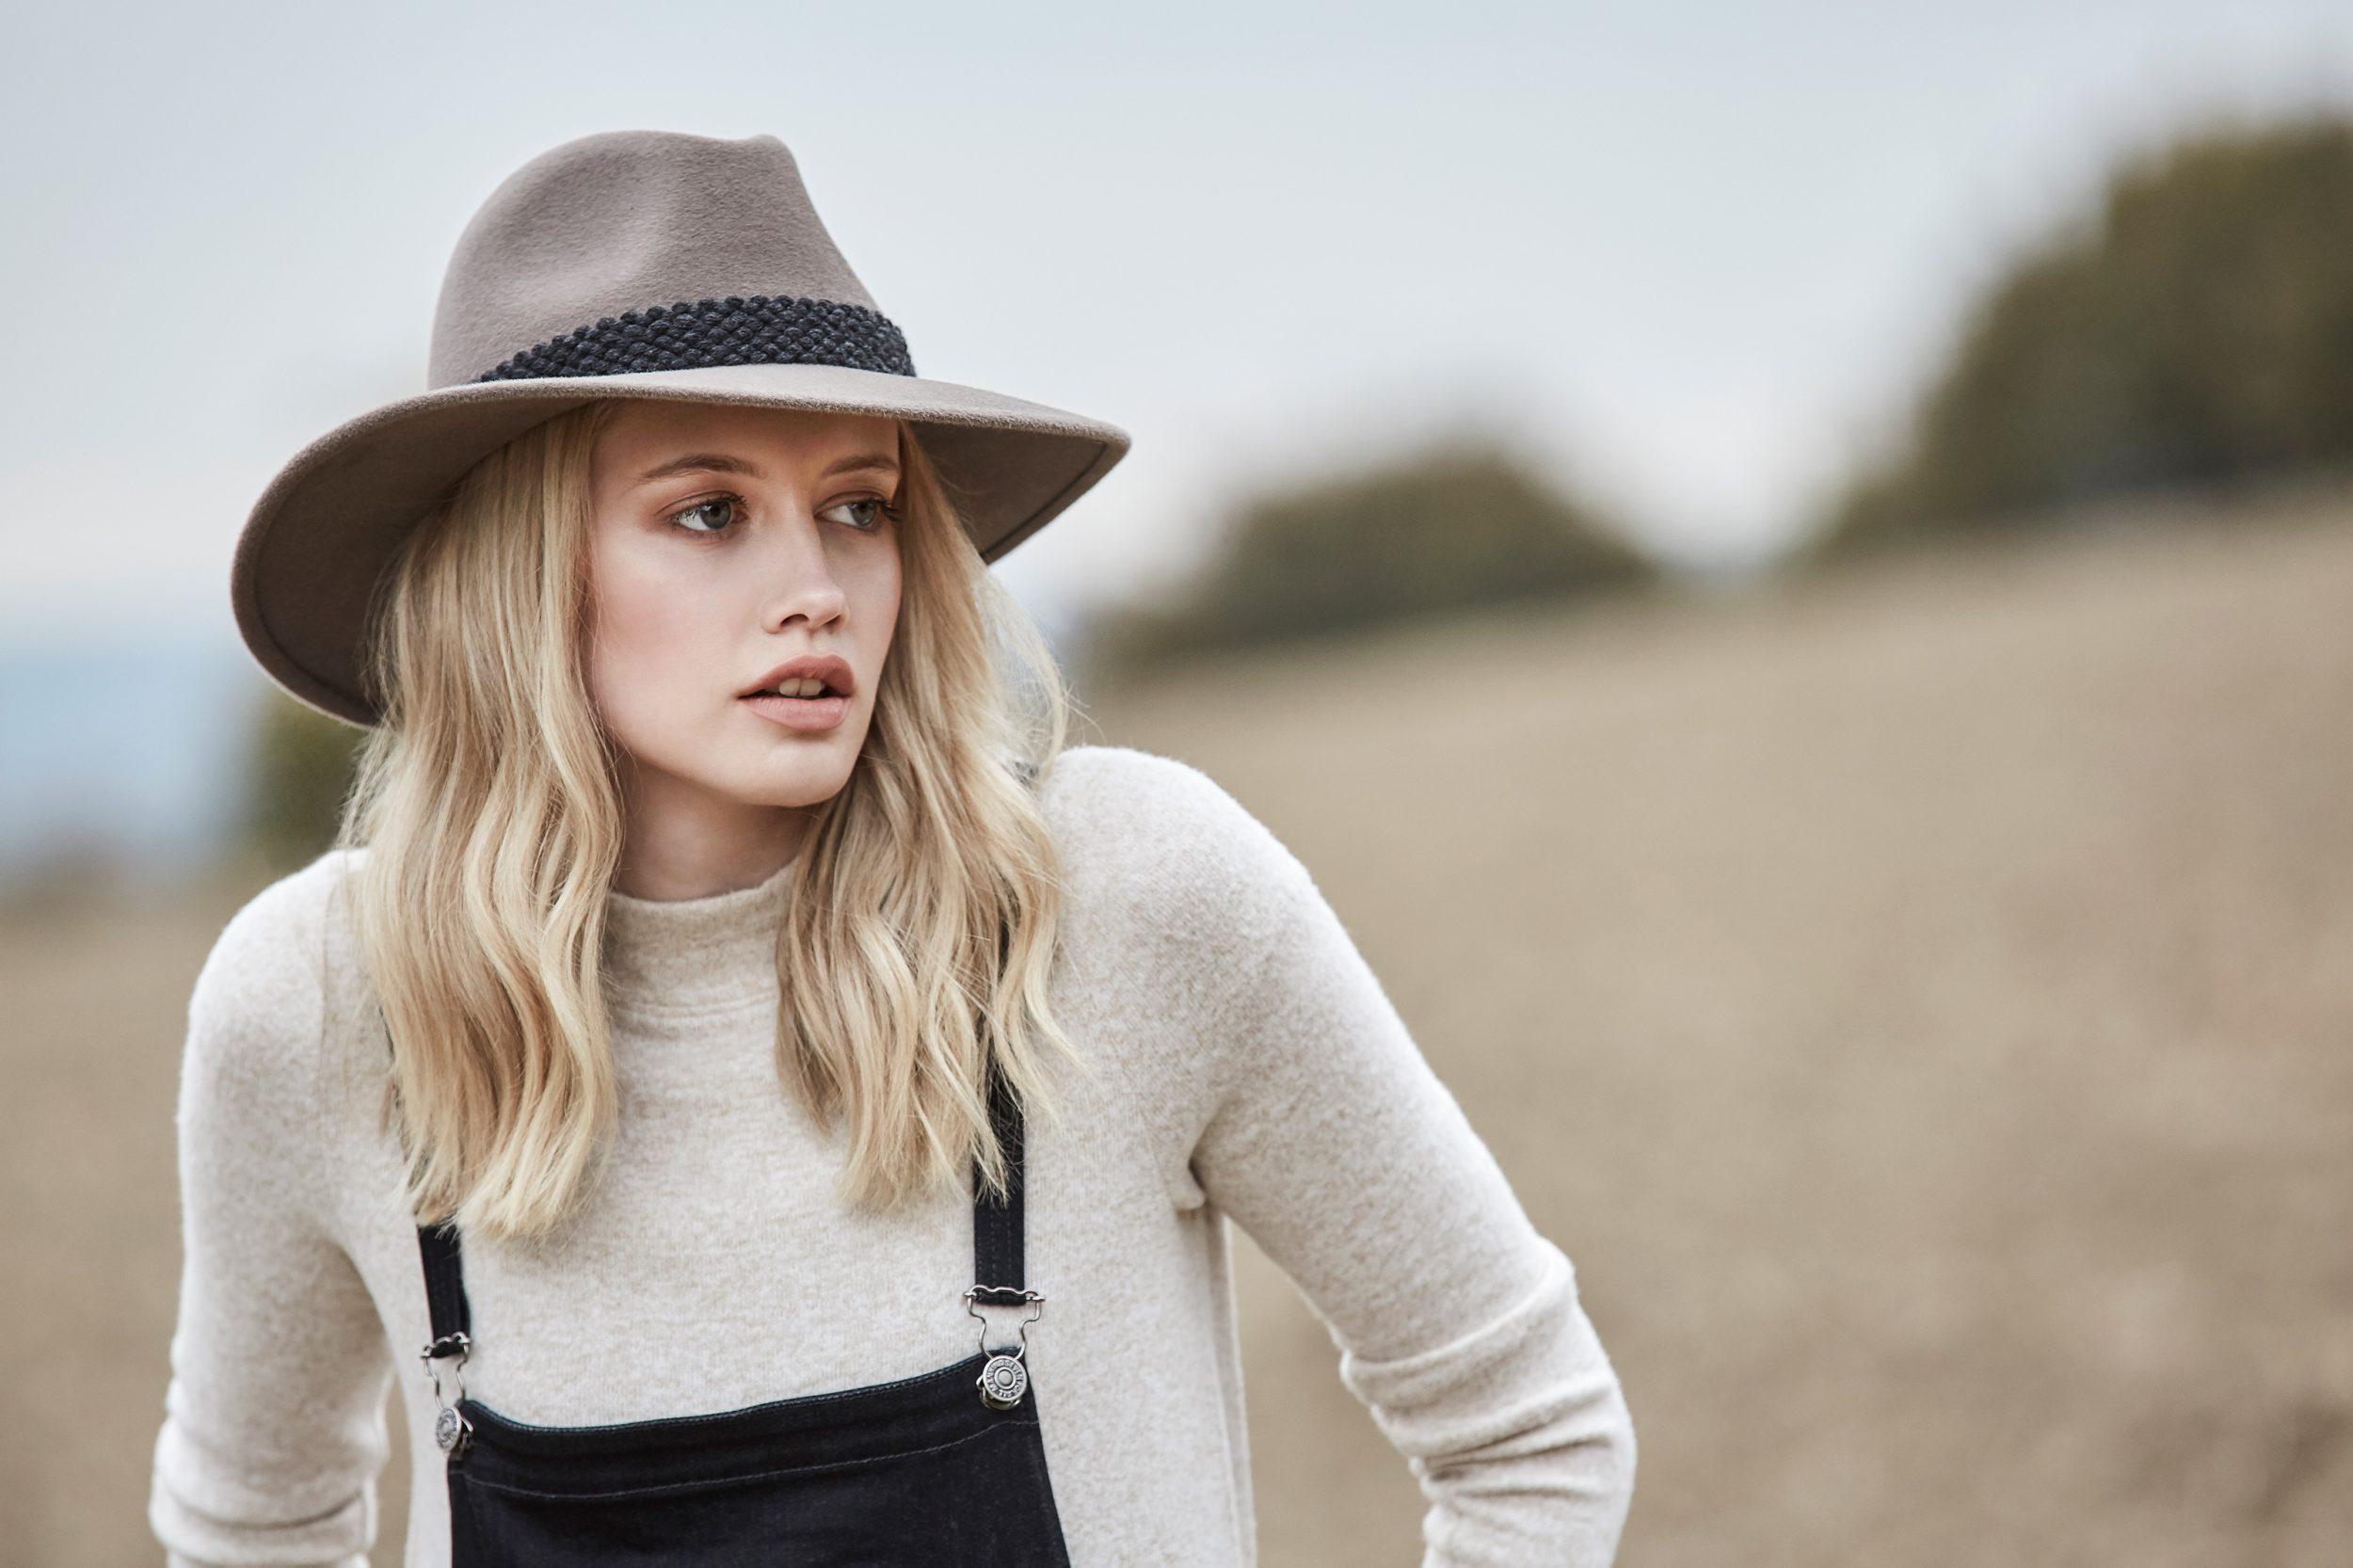 Women's Fashionable Hats